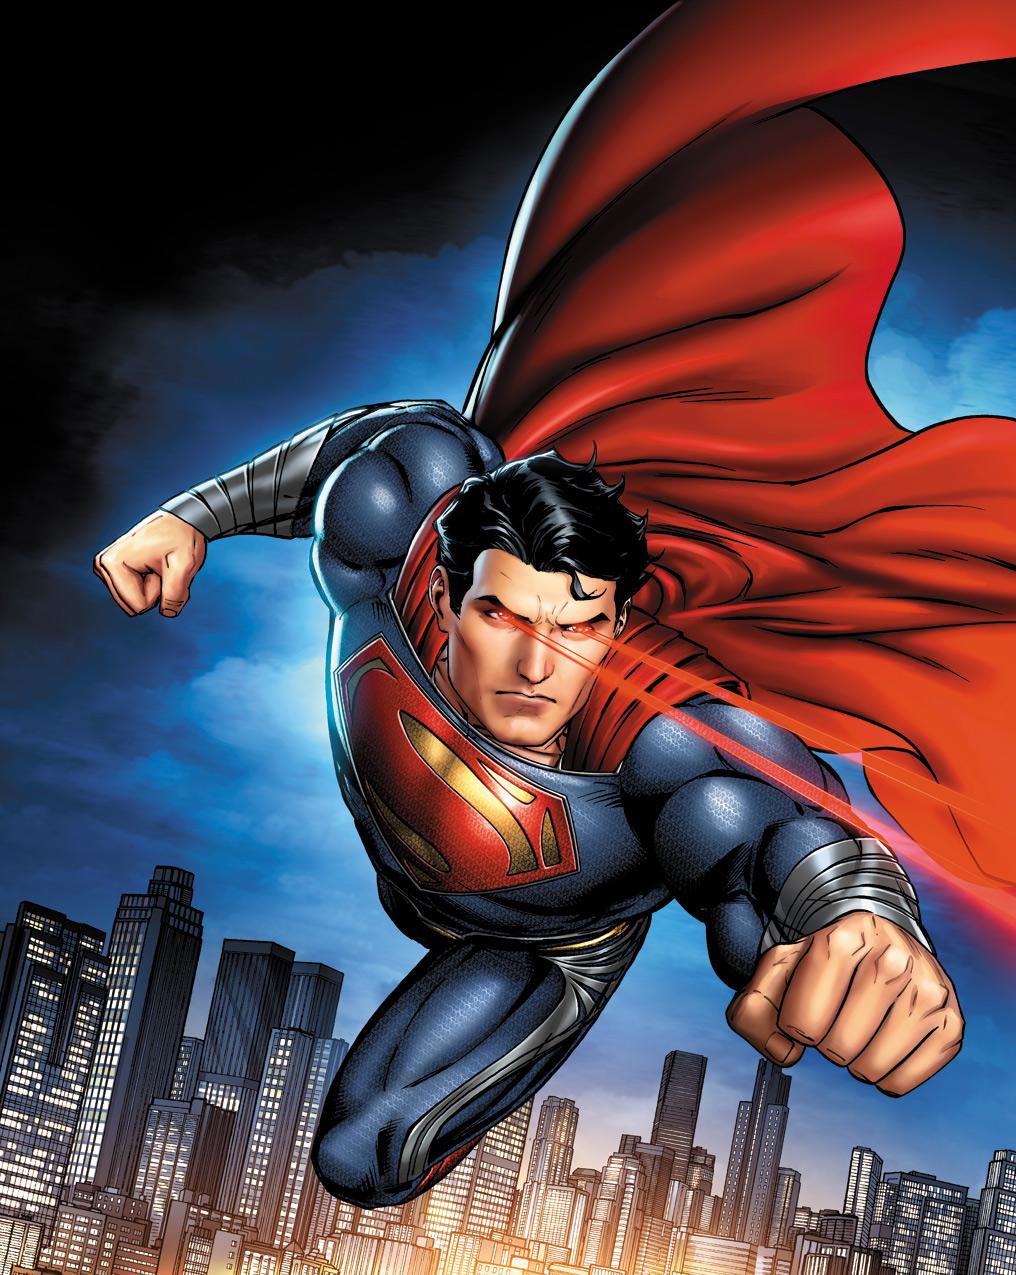 Man of Steel: Superpowers